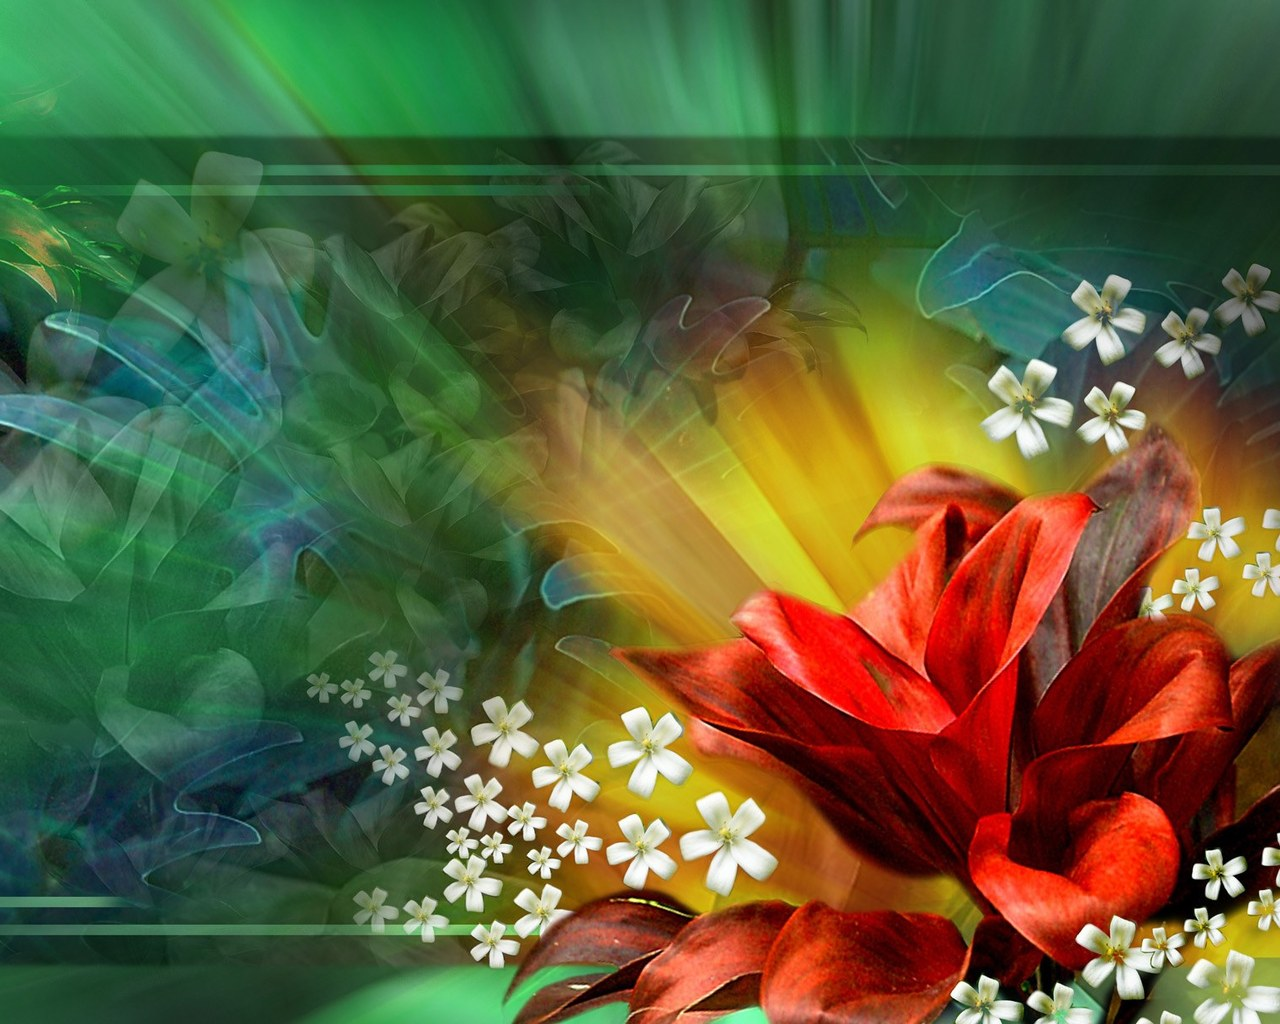 Nature wallpaper 3d Animated Desktop Animated Desktop Wallpaper 1280x1024